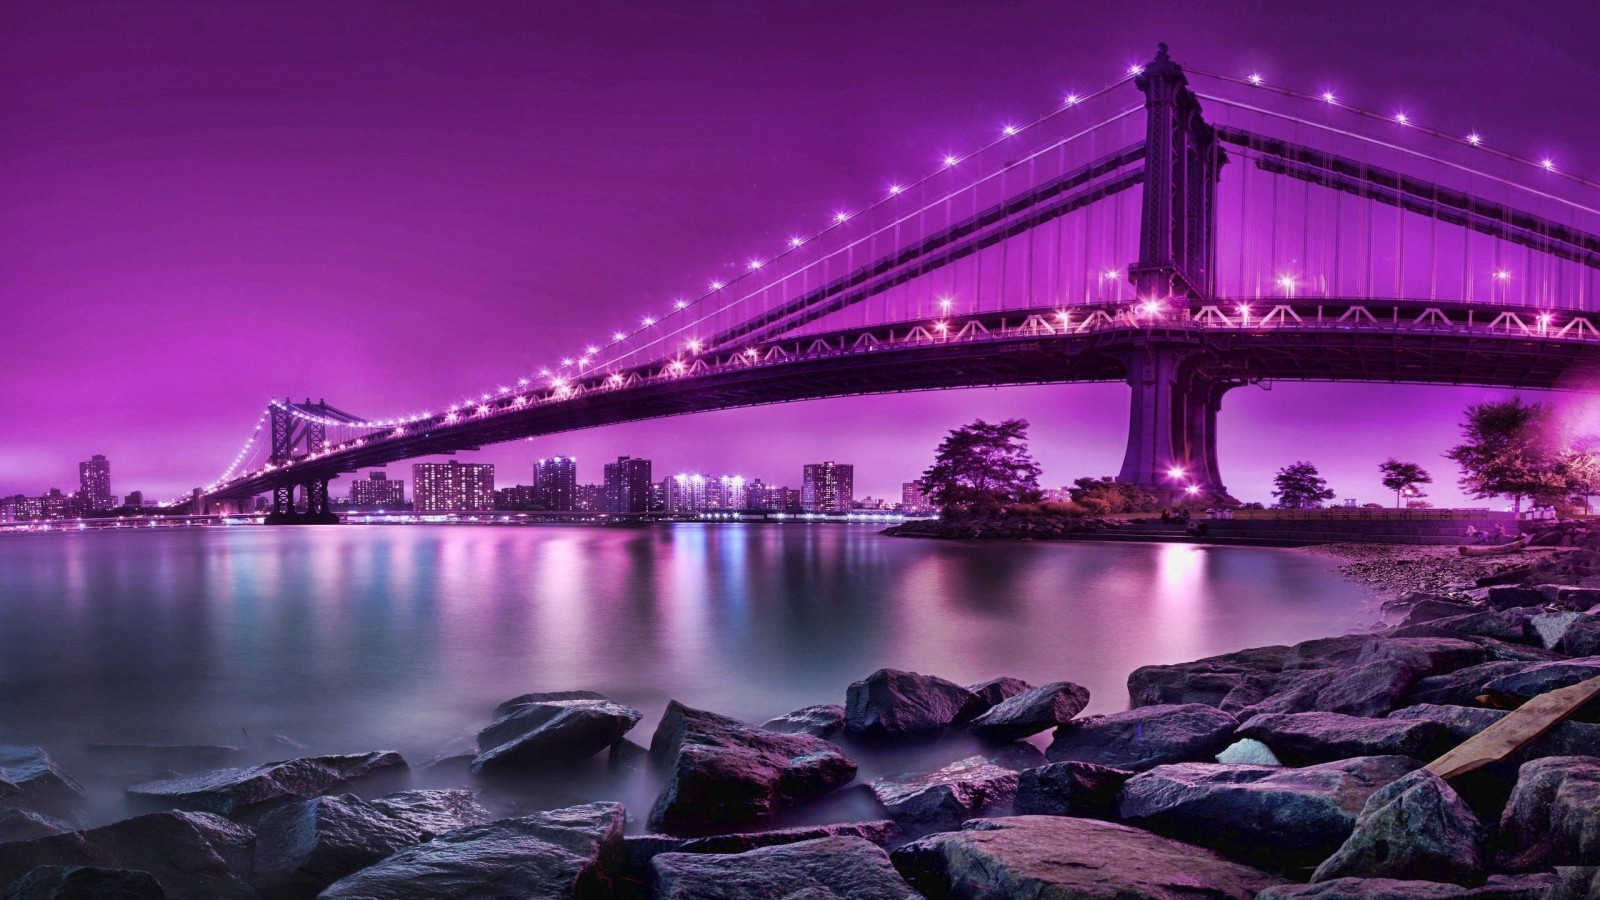 New York Bridge Wallpaper 1600x900